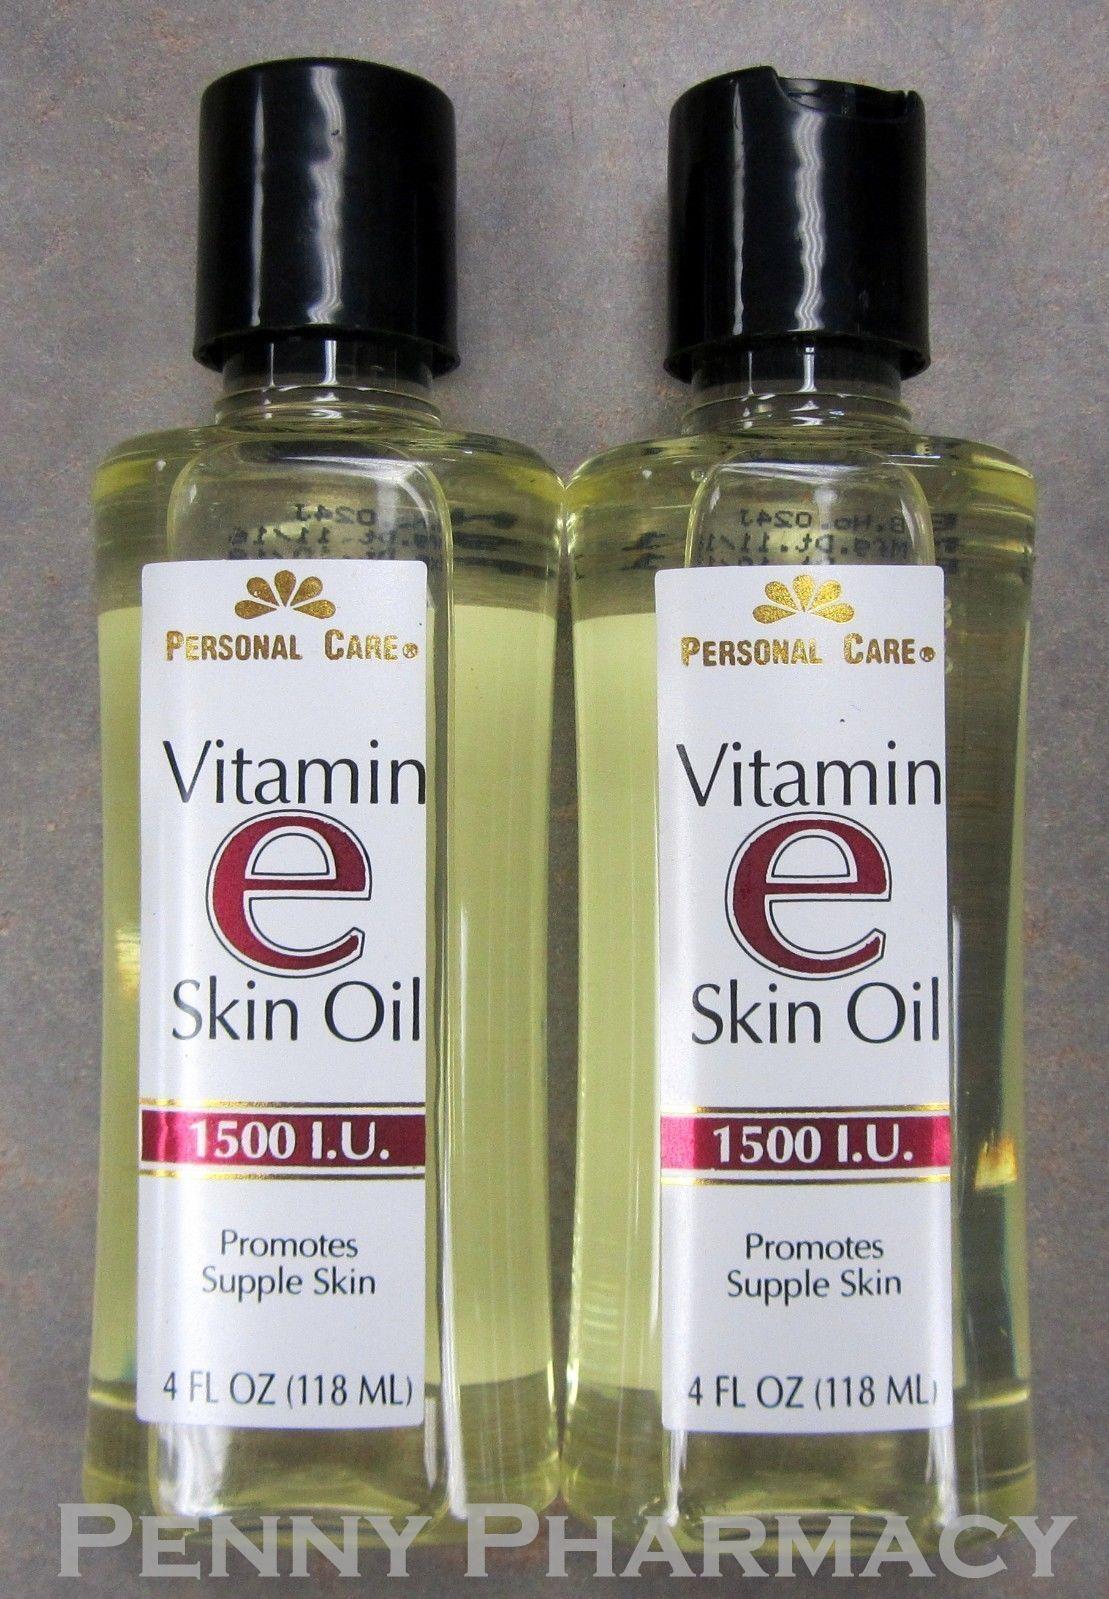 Vitamin E Skin Oil 1500 I.U. 4oz Personal Care  FRESH